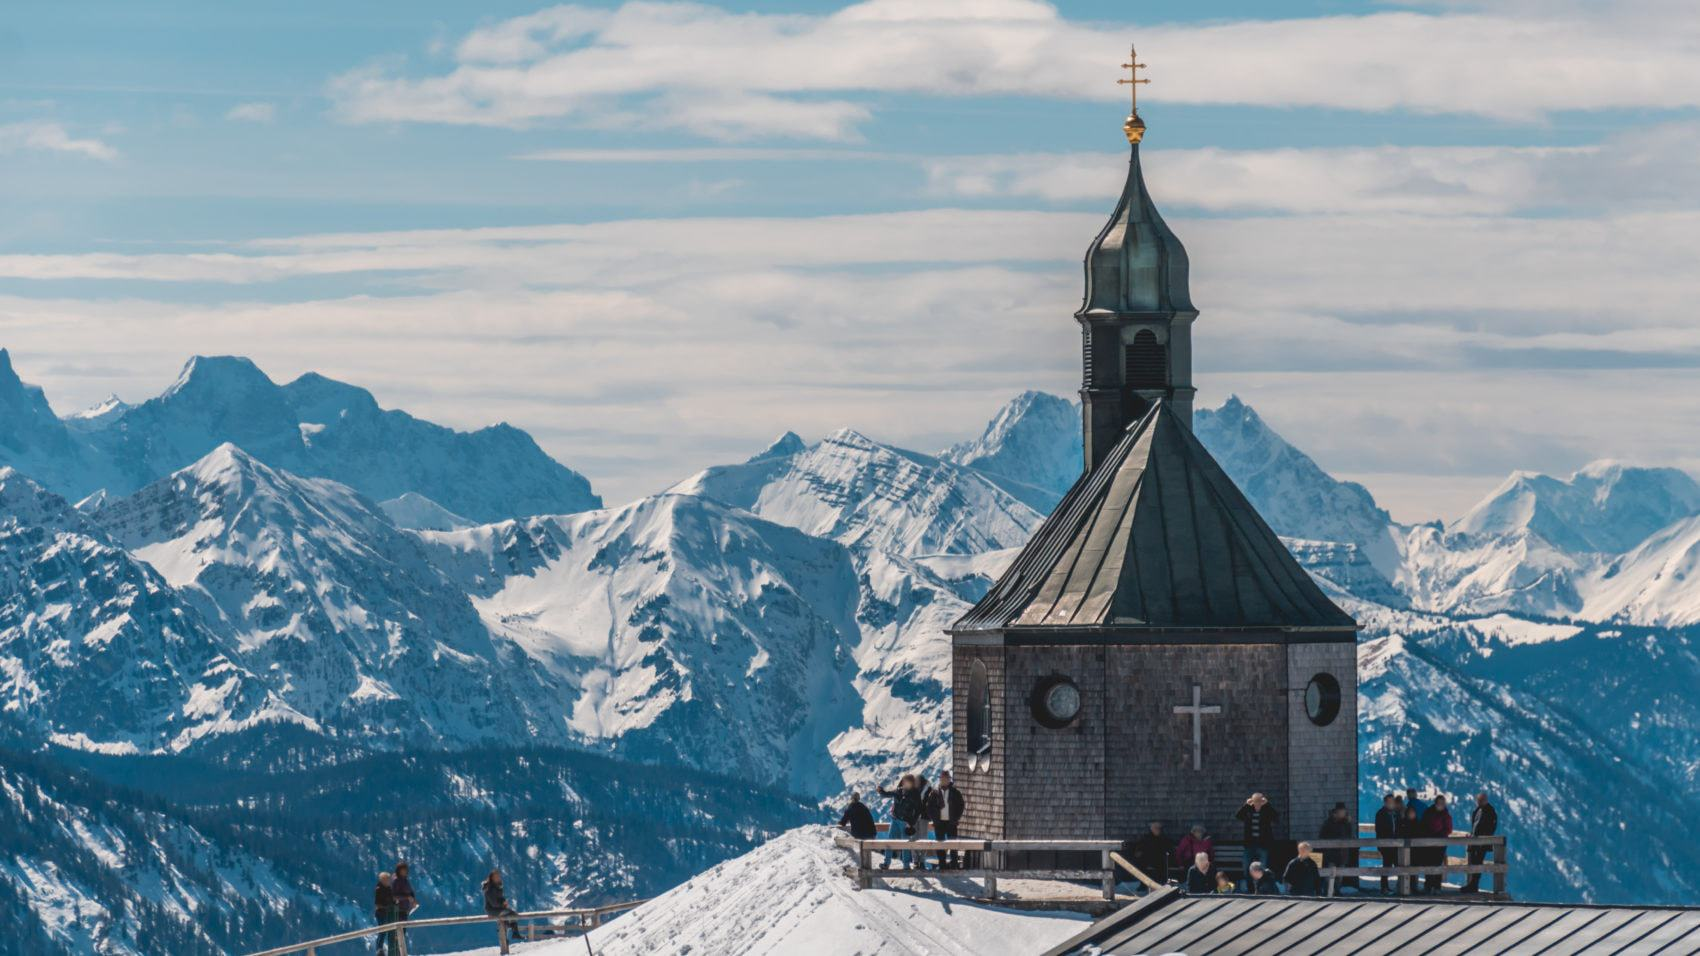 Kerkje op de Wallberg aan de Tegernsee in Beieren